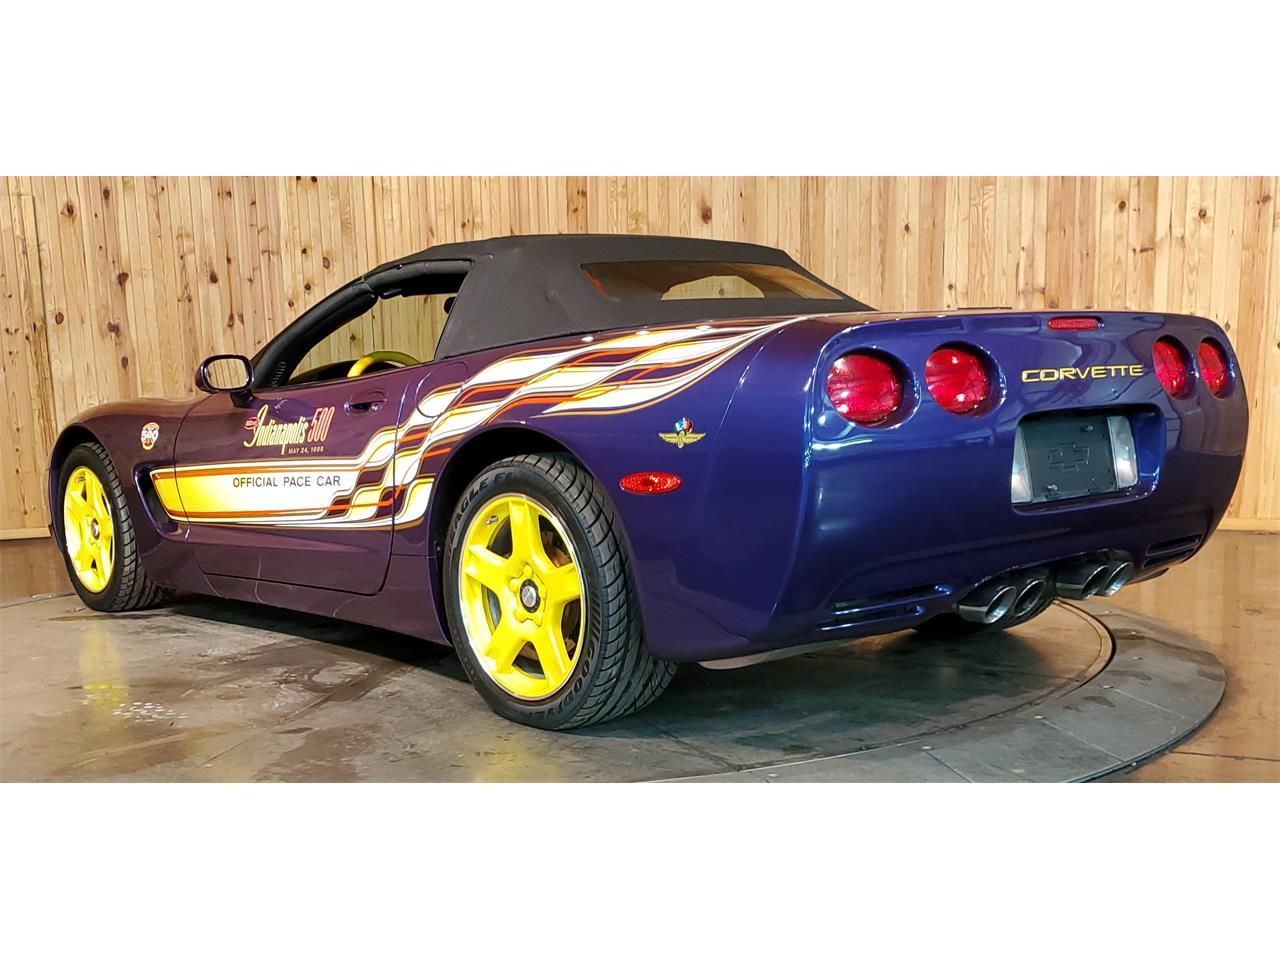 1998 Chevrolet Corvette (CC-1320537) for sale in Lebanon, Missouri